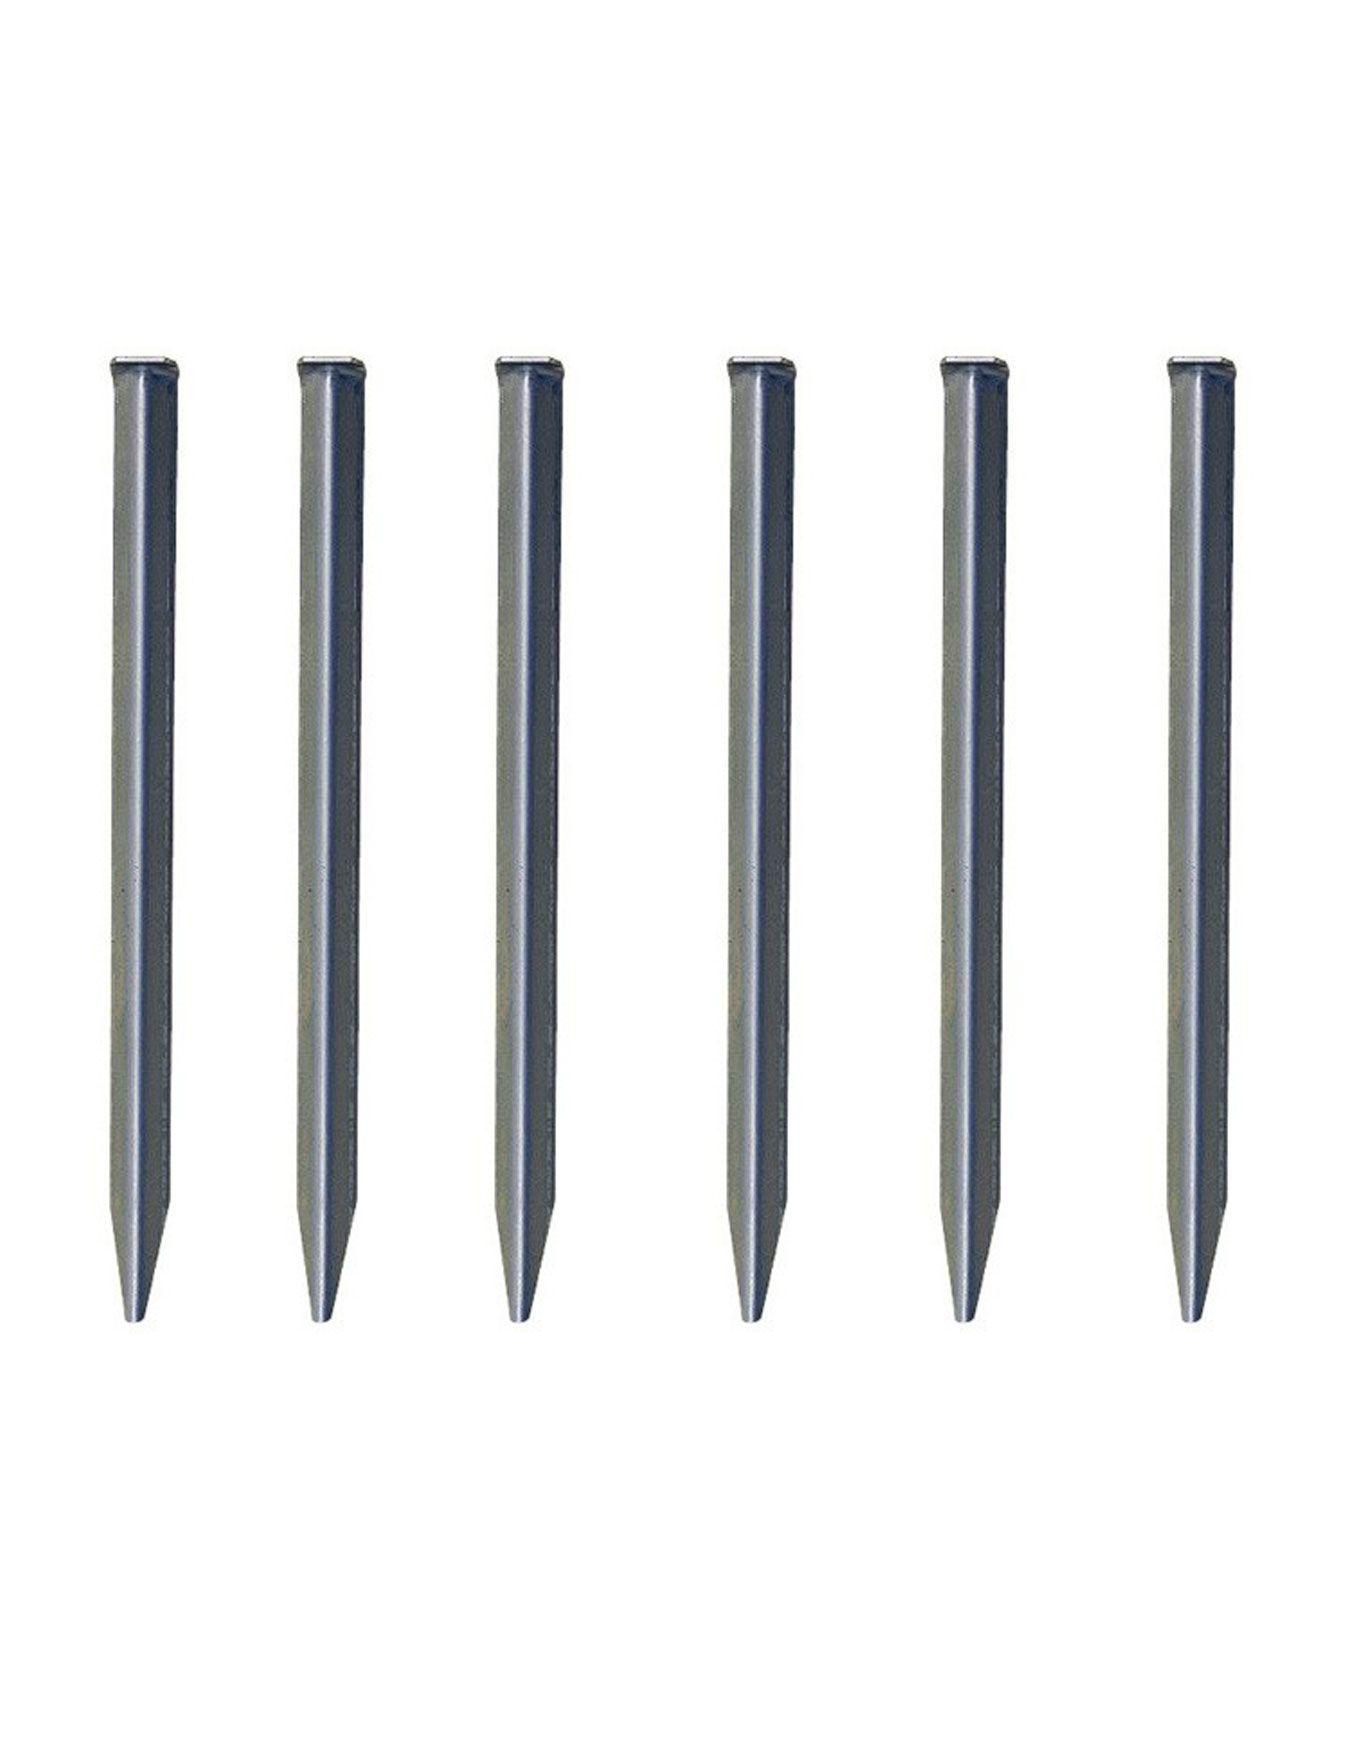 piquet corniere acier galvanise 10 trigano accessoires camping snowleader. Black Bedroom Furniture Sets. Home Design Ideas